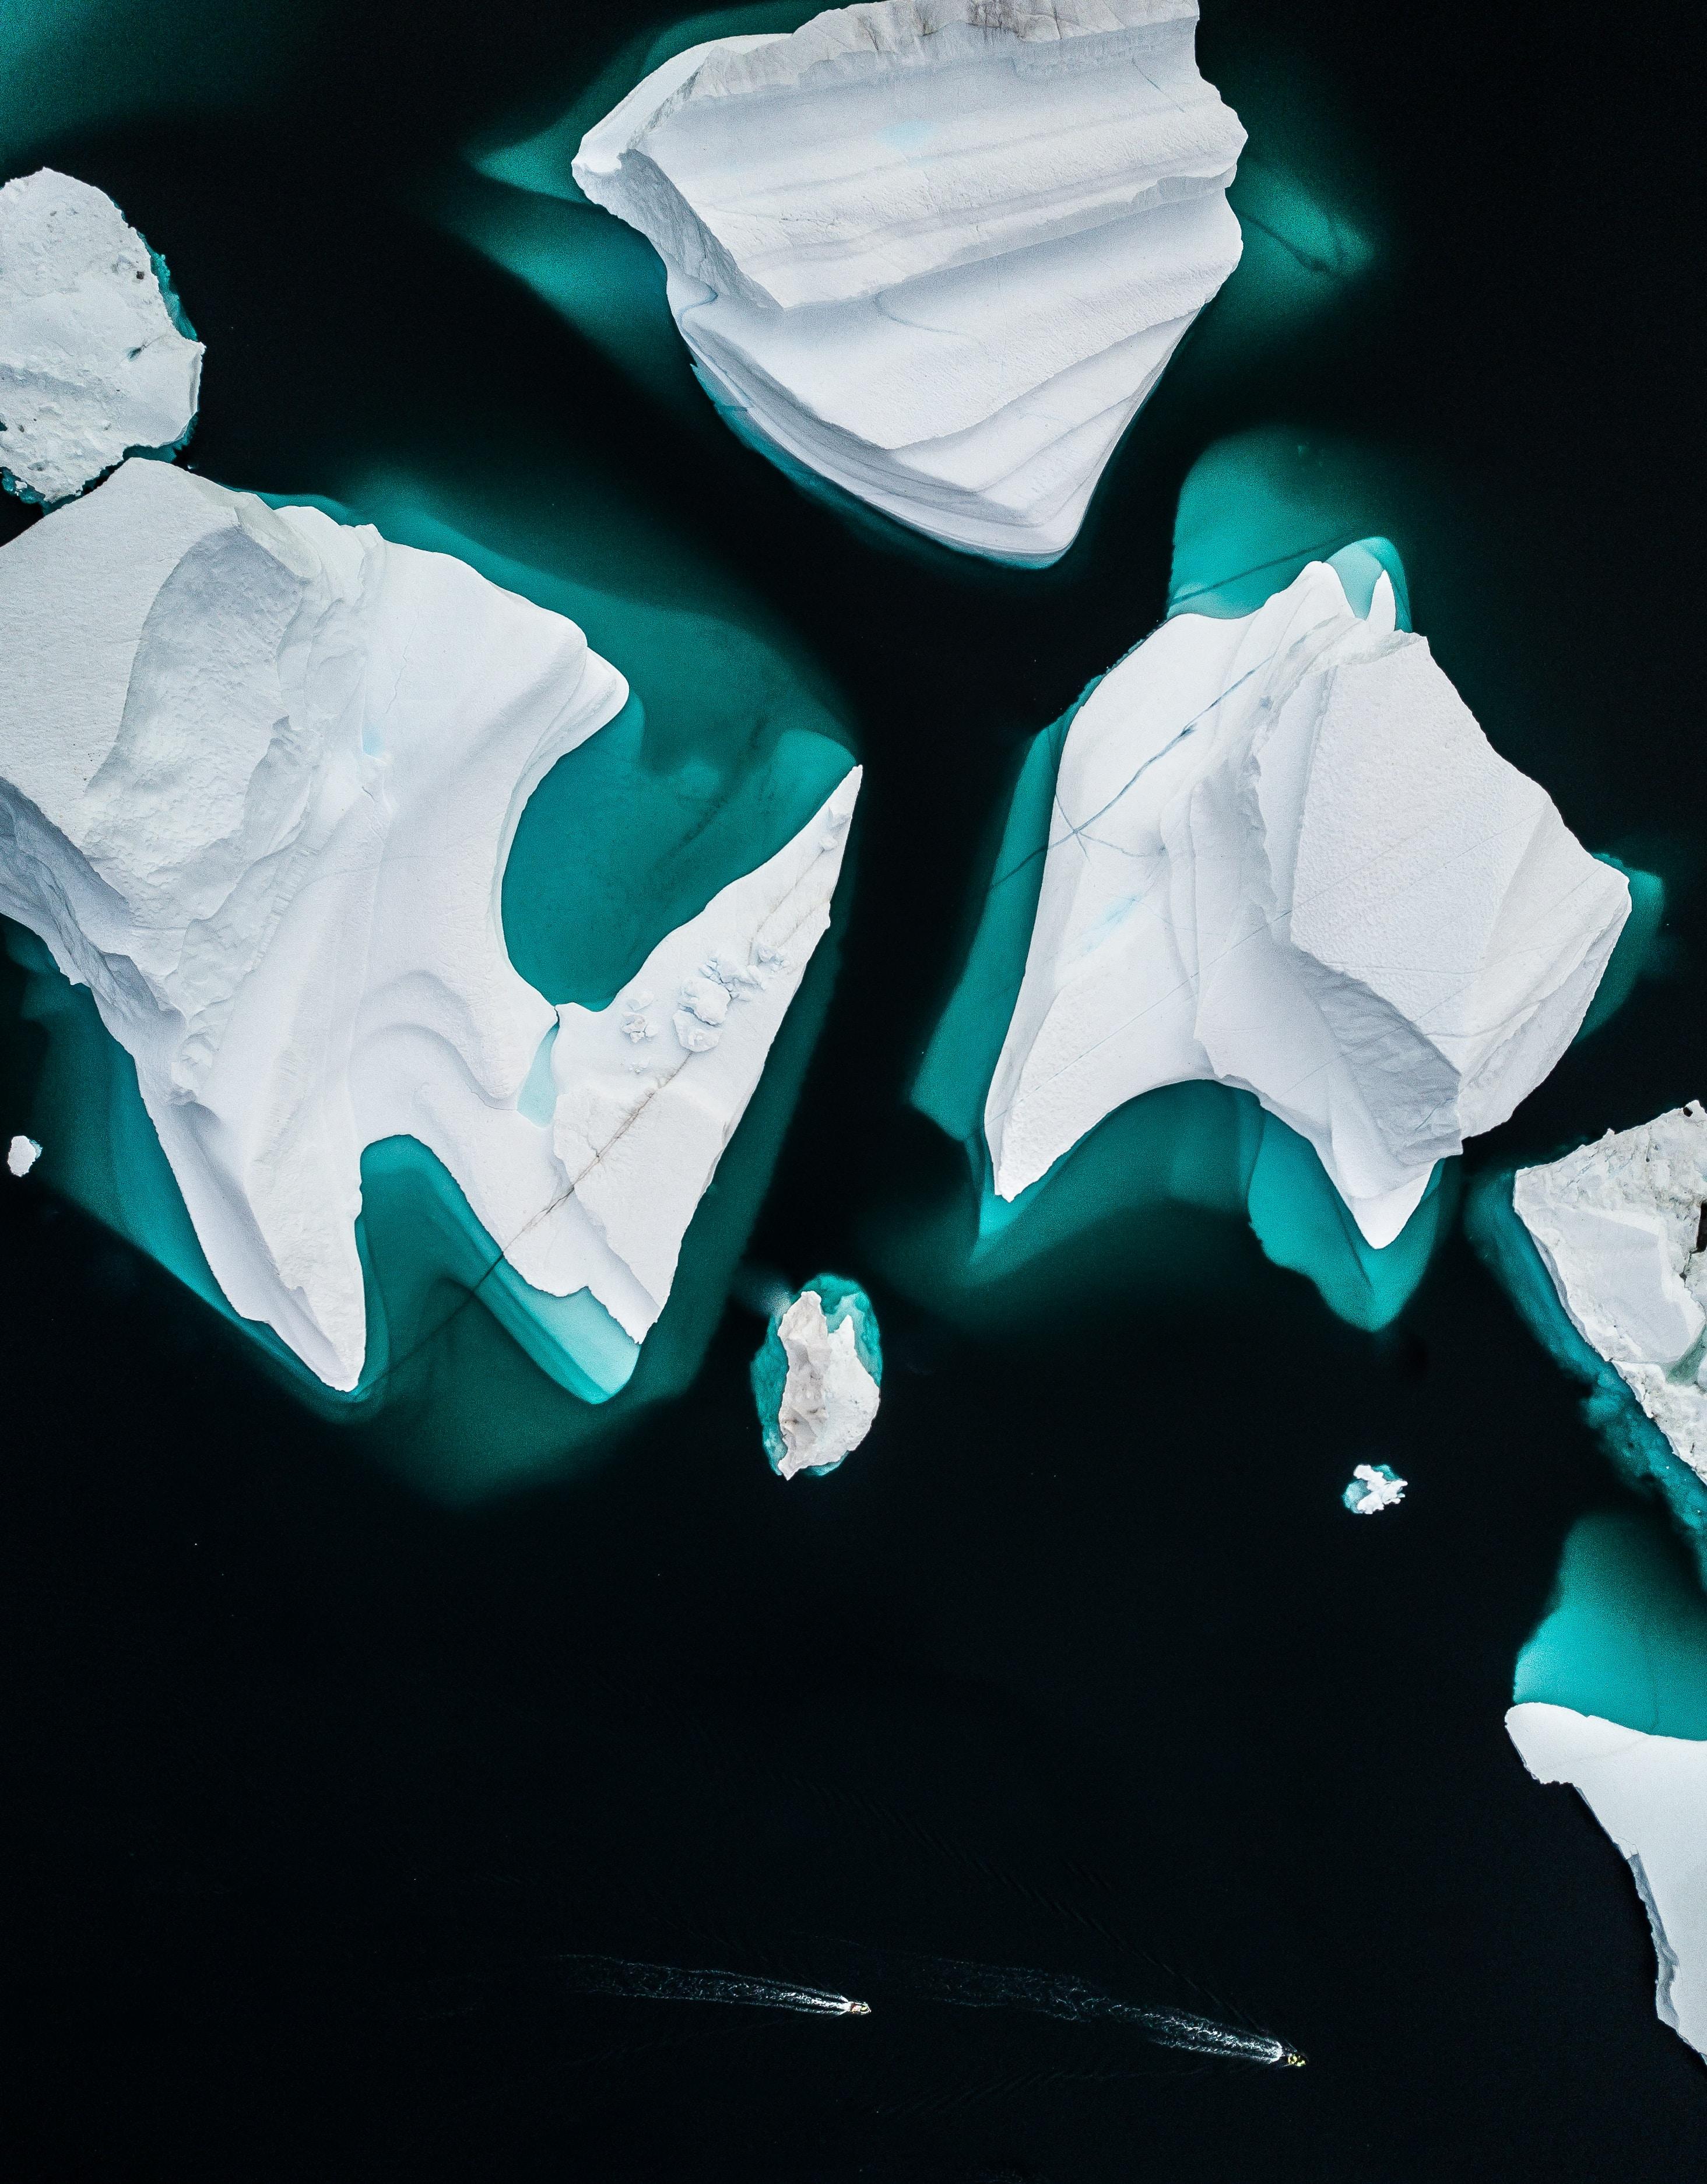 iceberg collage